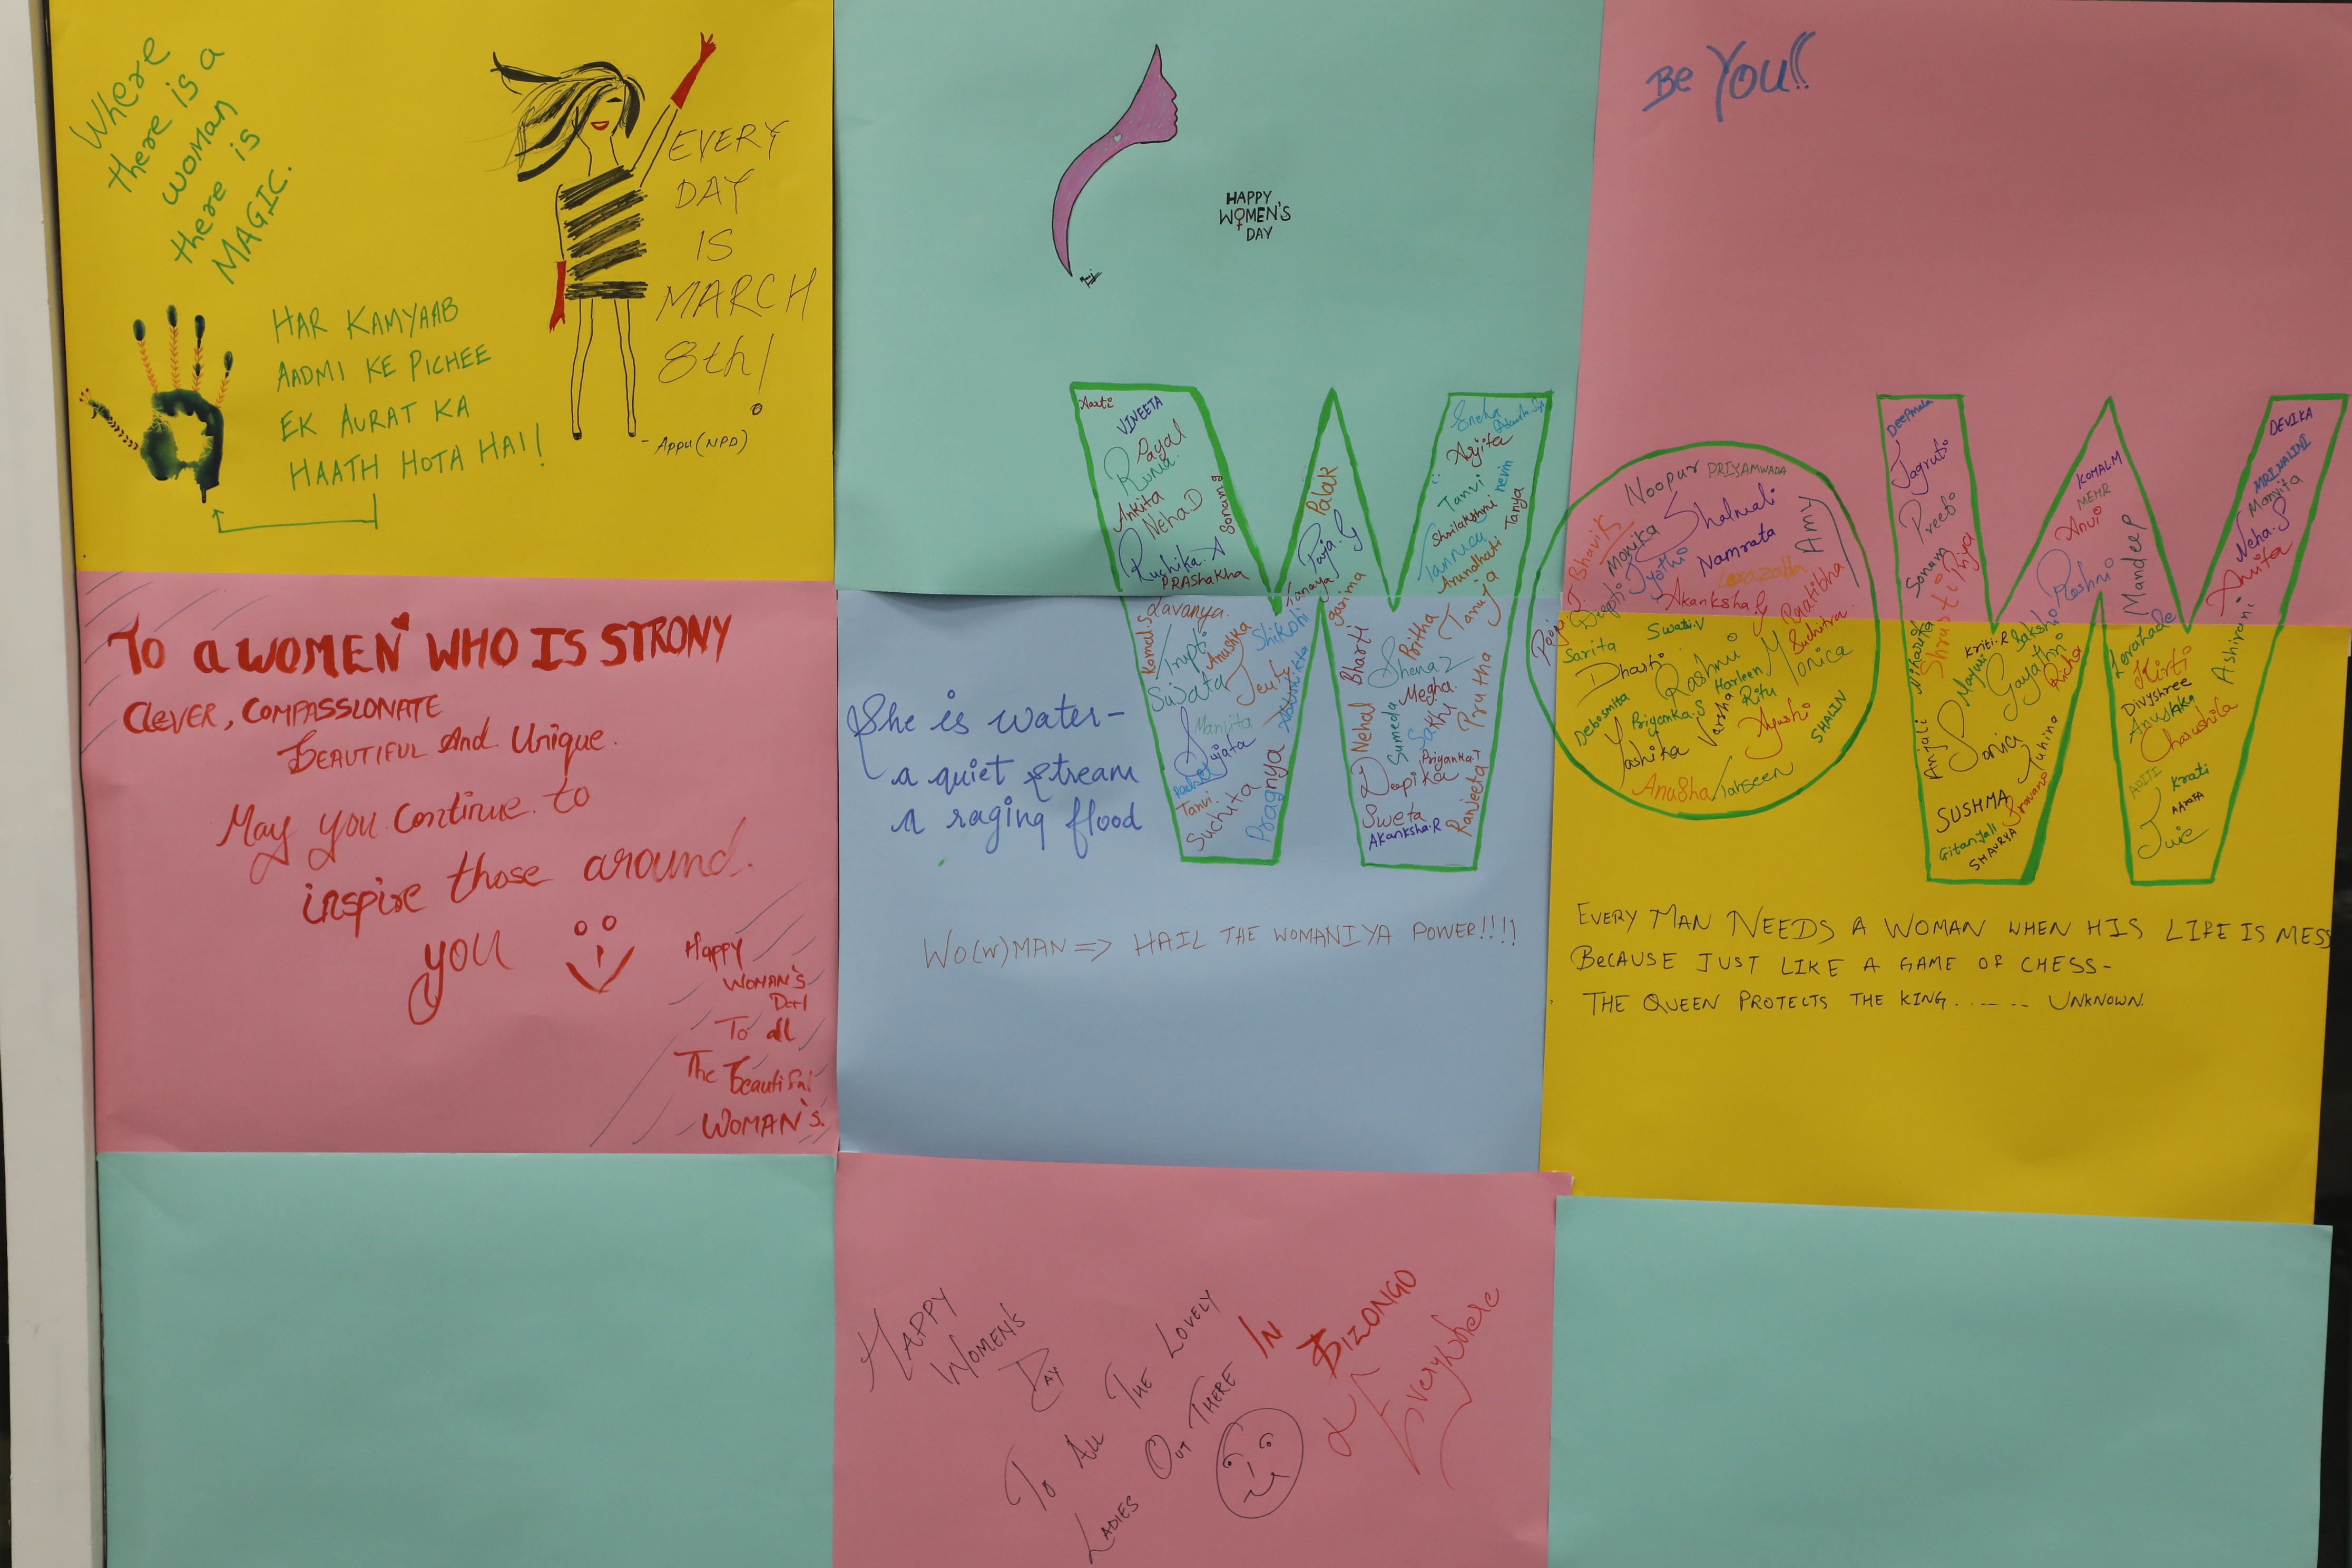 Women's day celebration - thoughtful message board